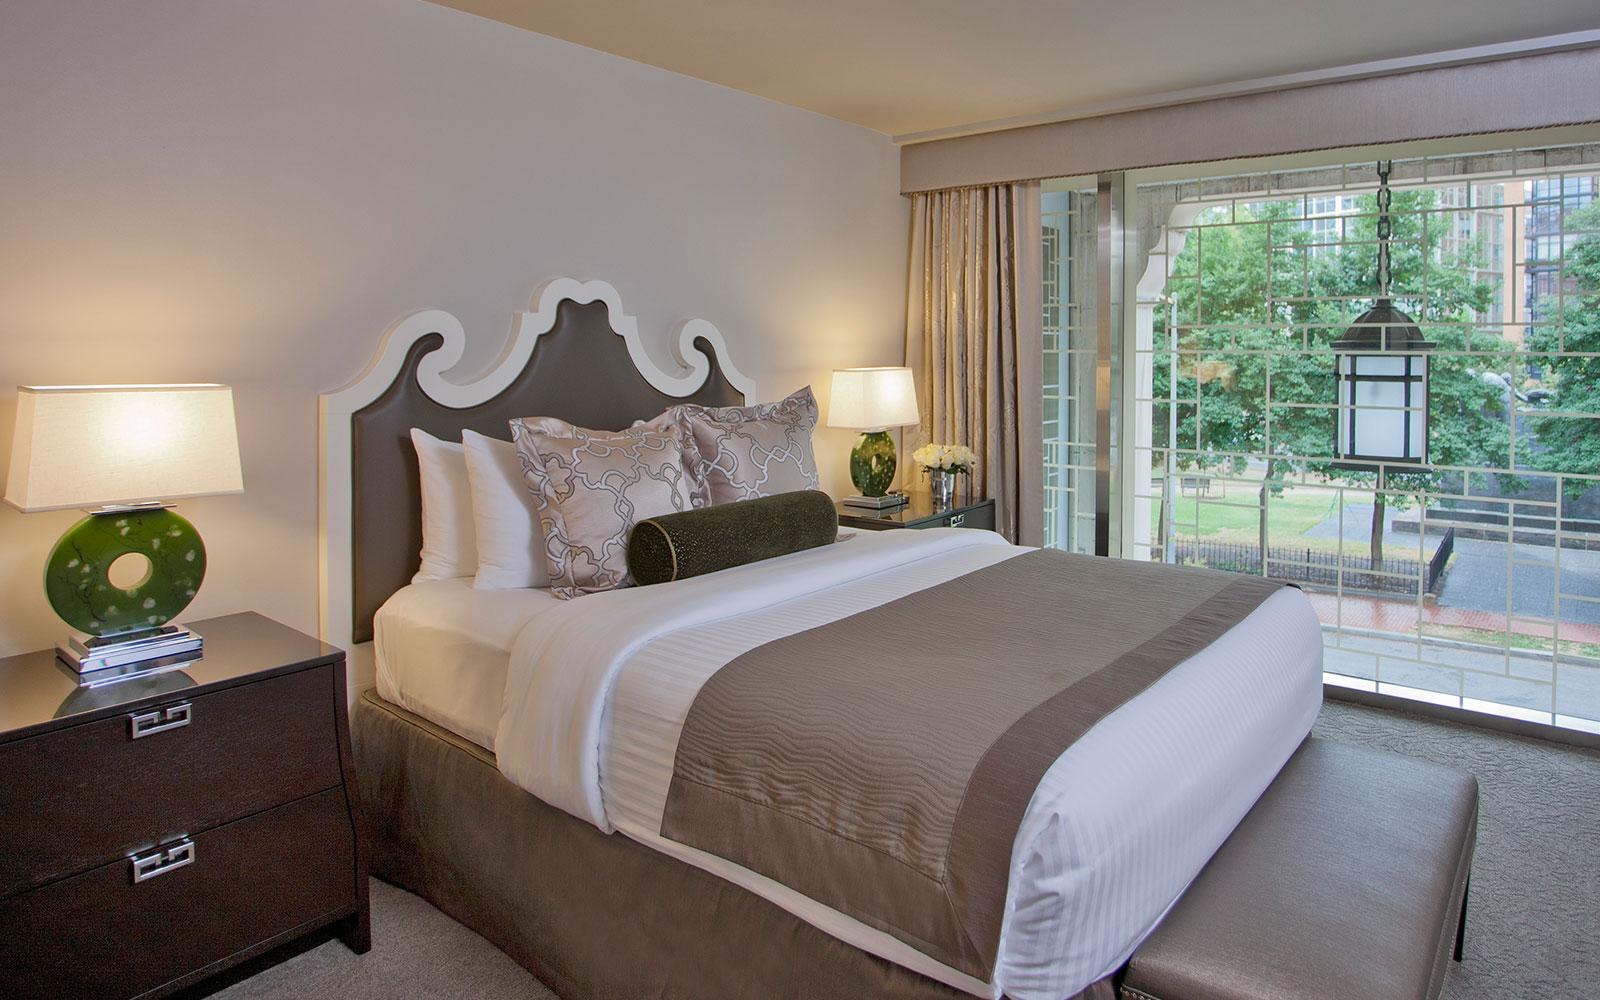 Rooms at Morrison-Clark Historic Inn & Restaurant - Washington, DC